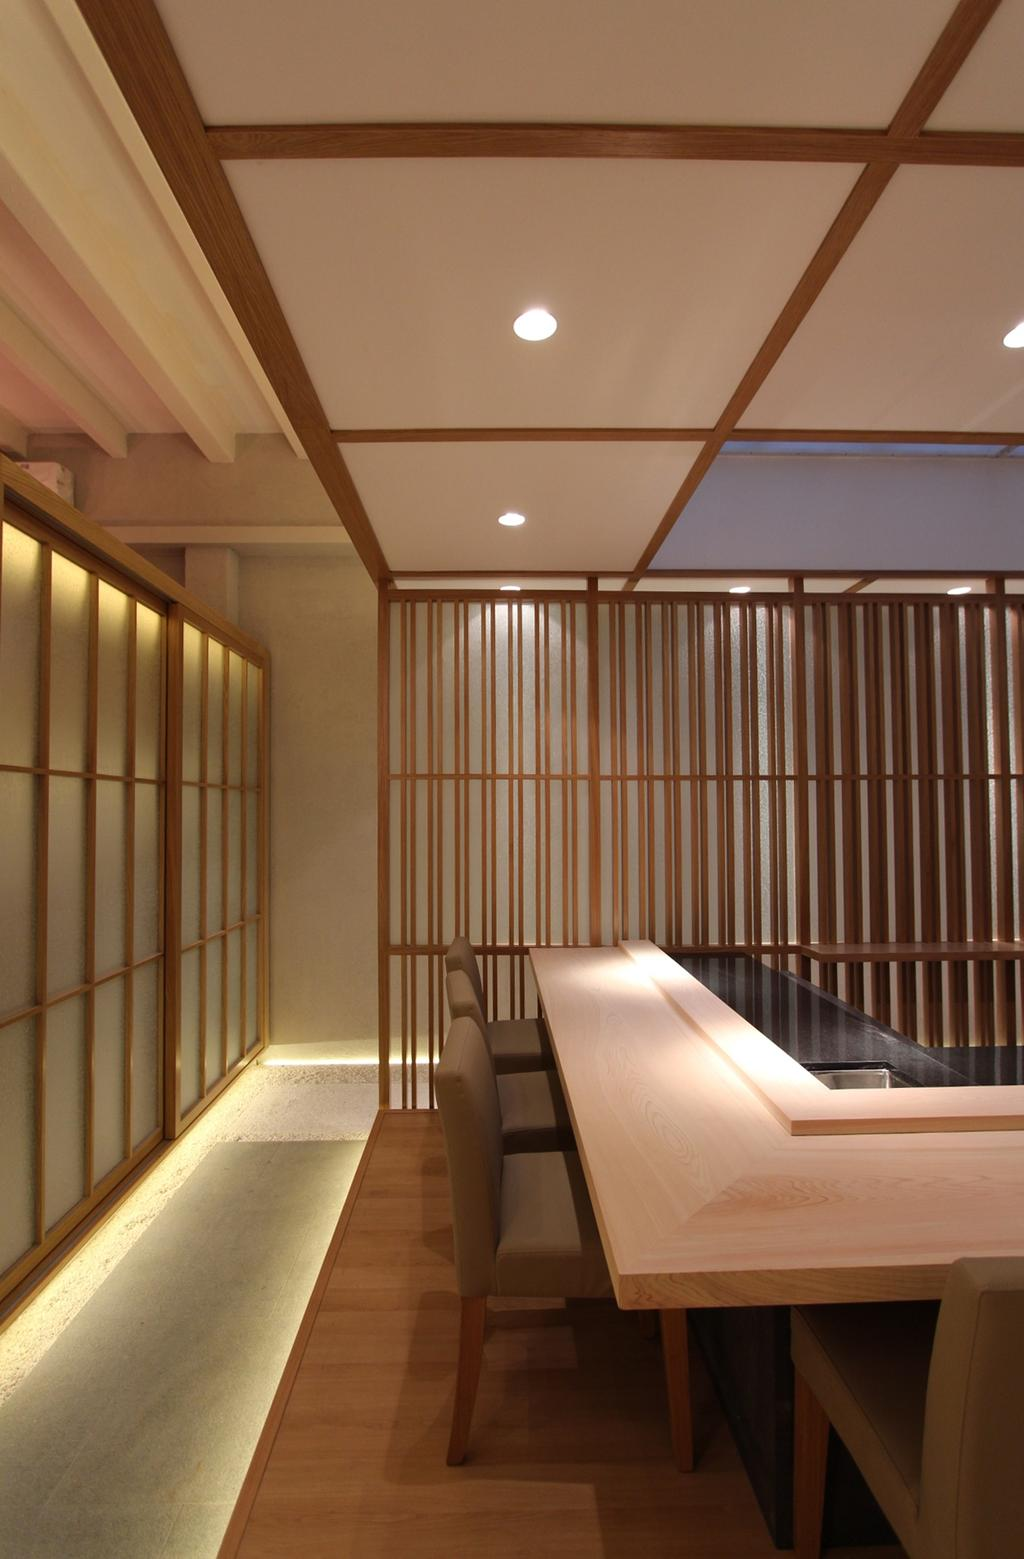 Sushi Mitsuya Restaurant, Commercial, Architect, EHKA Studio, Minimalistic